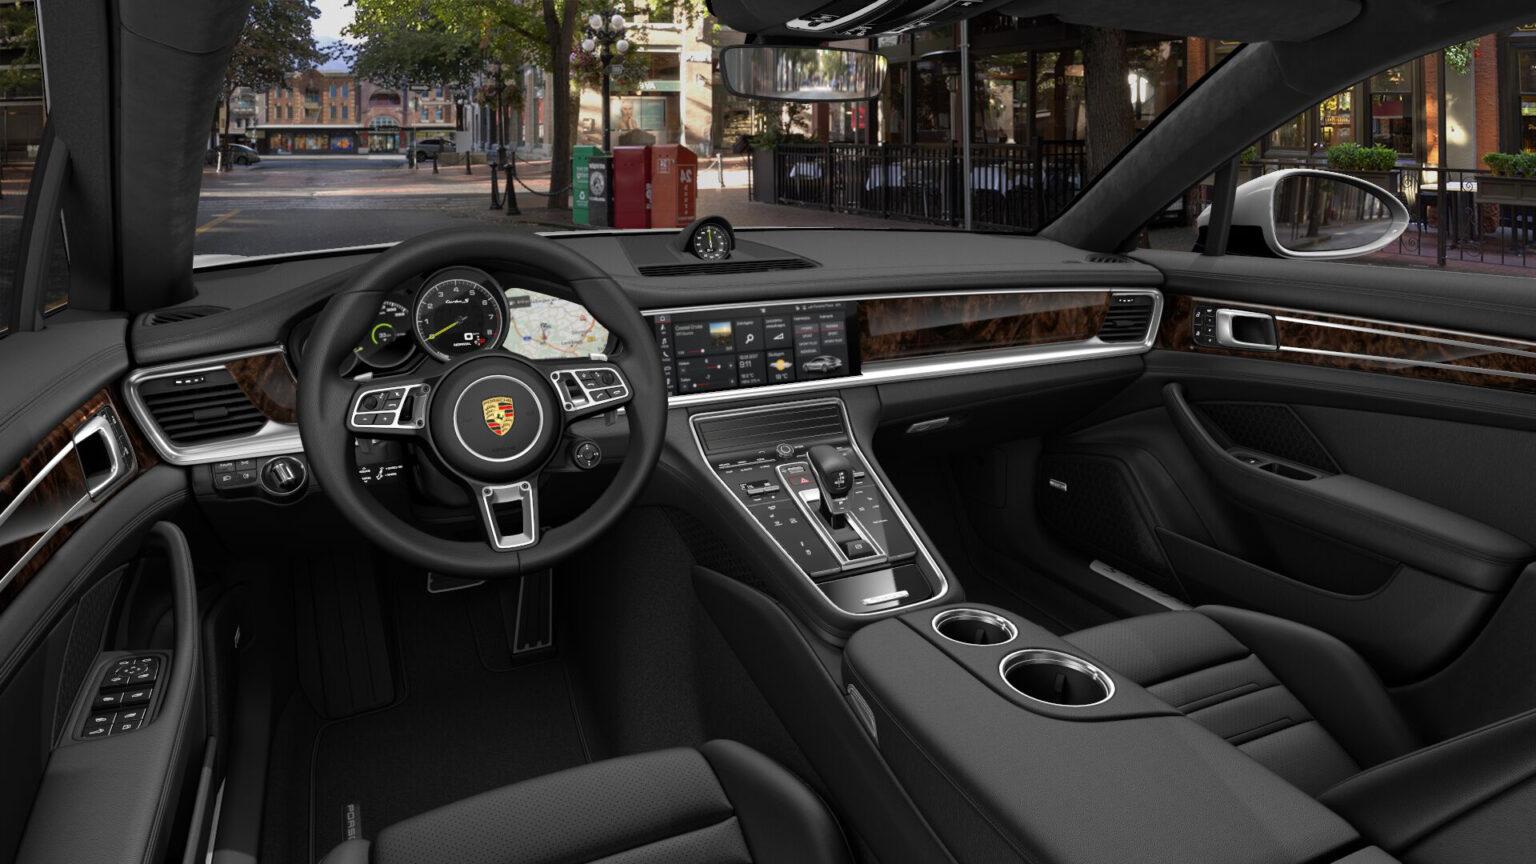 Porsche Panamera Turbo S E Hybrid Interior 01